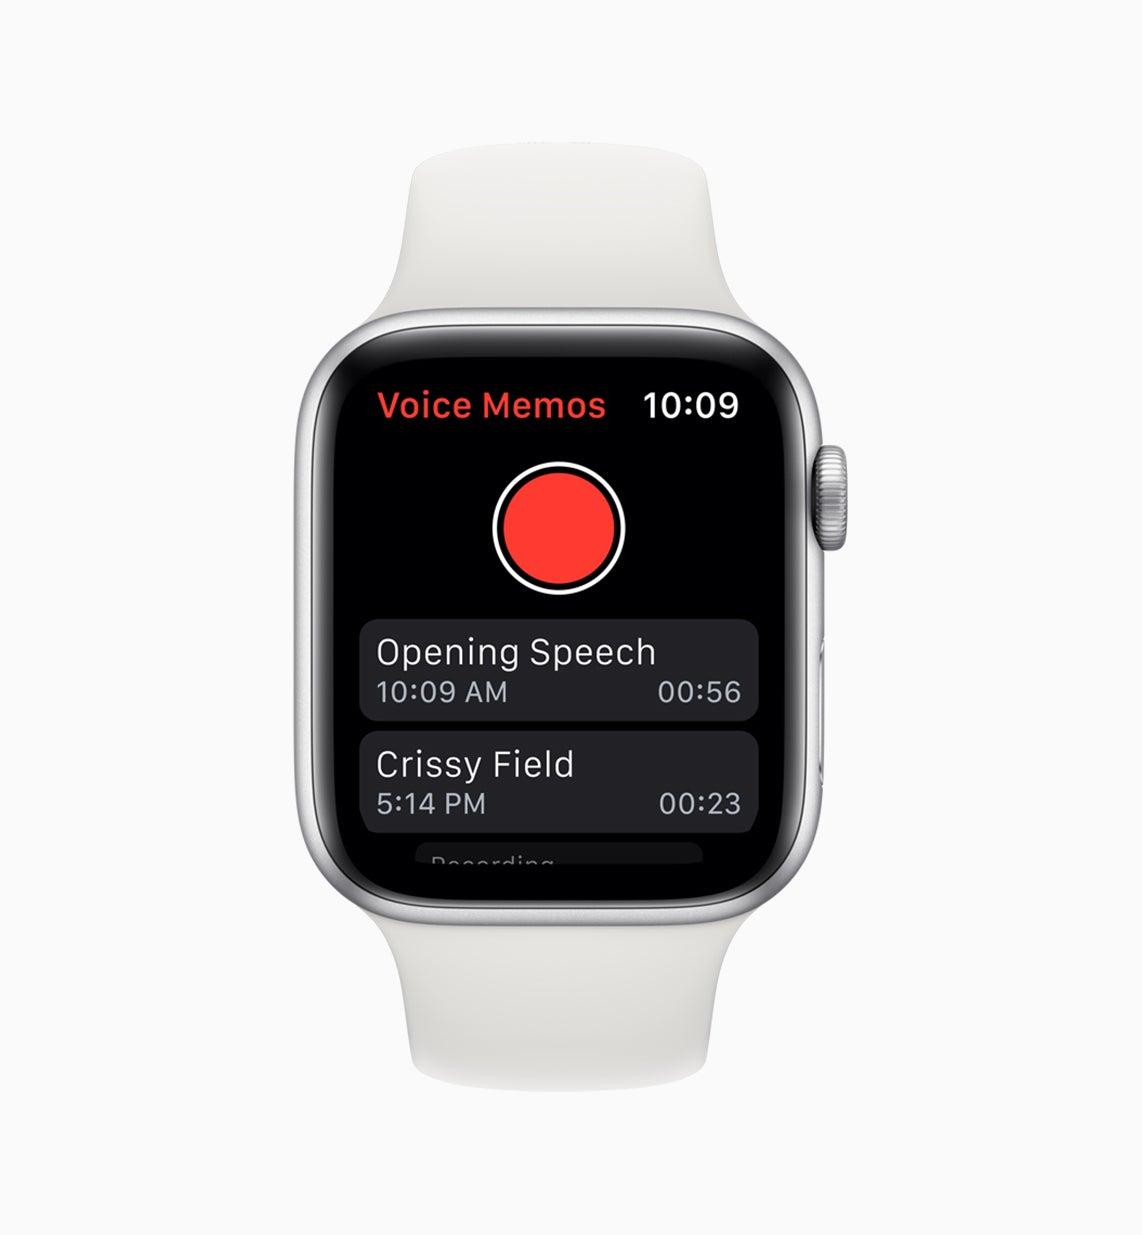 apple-watchos6_voice-memos